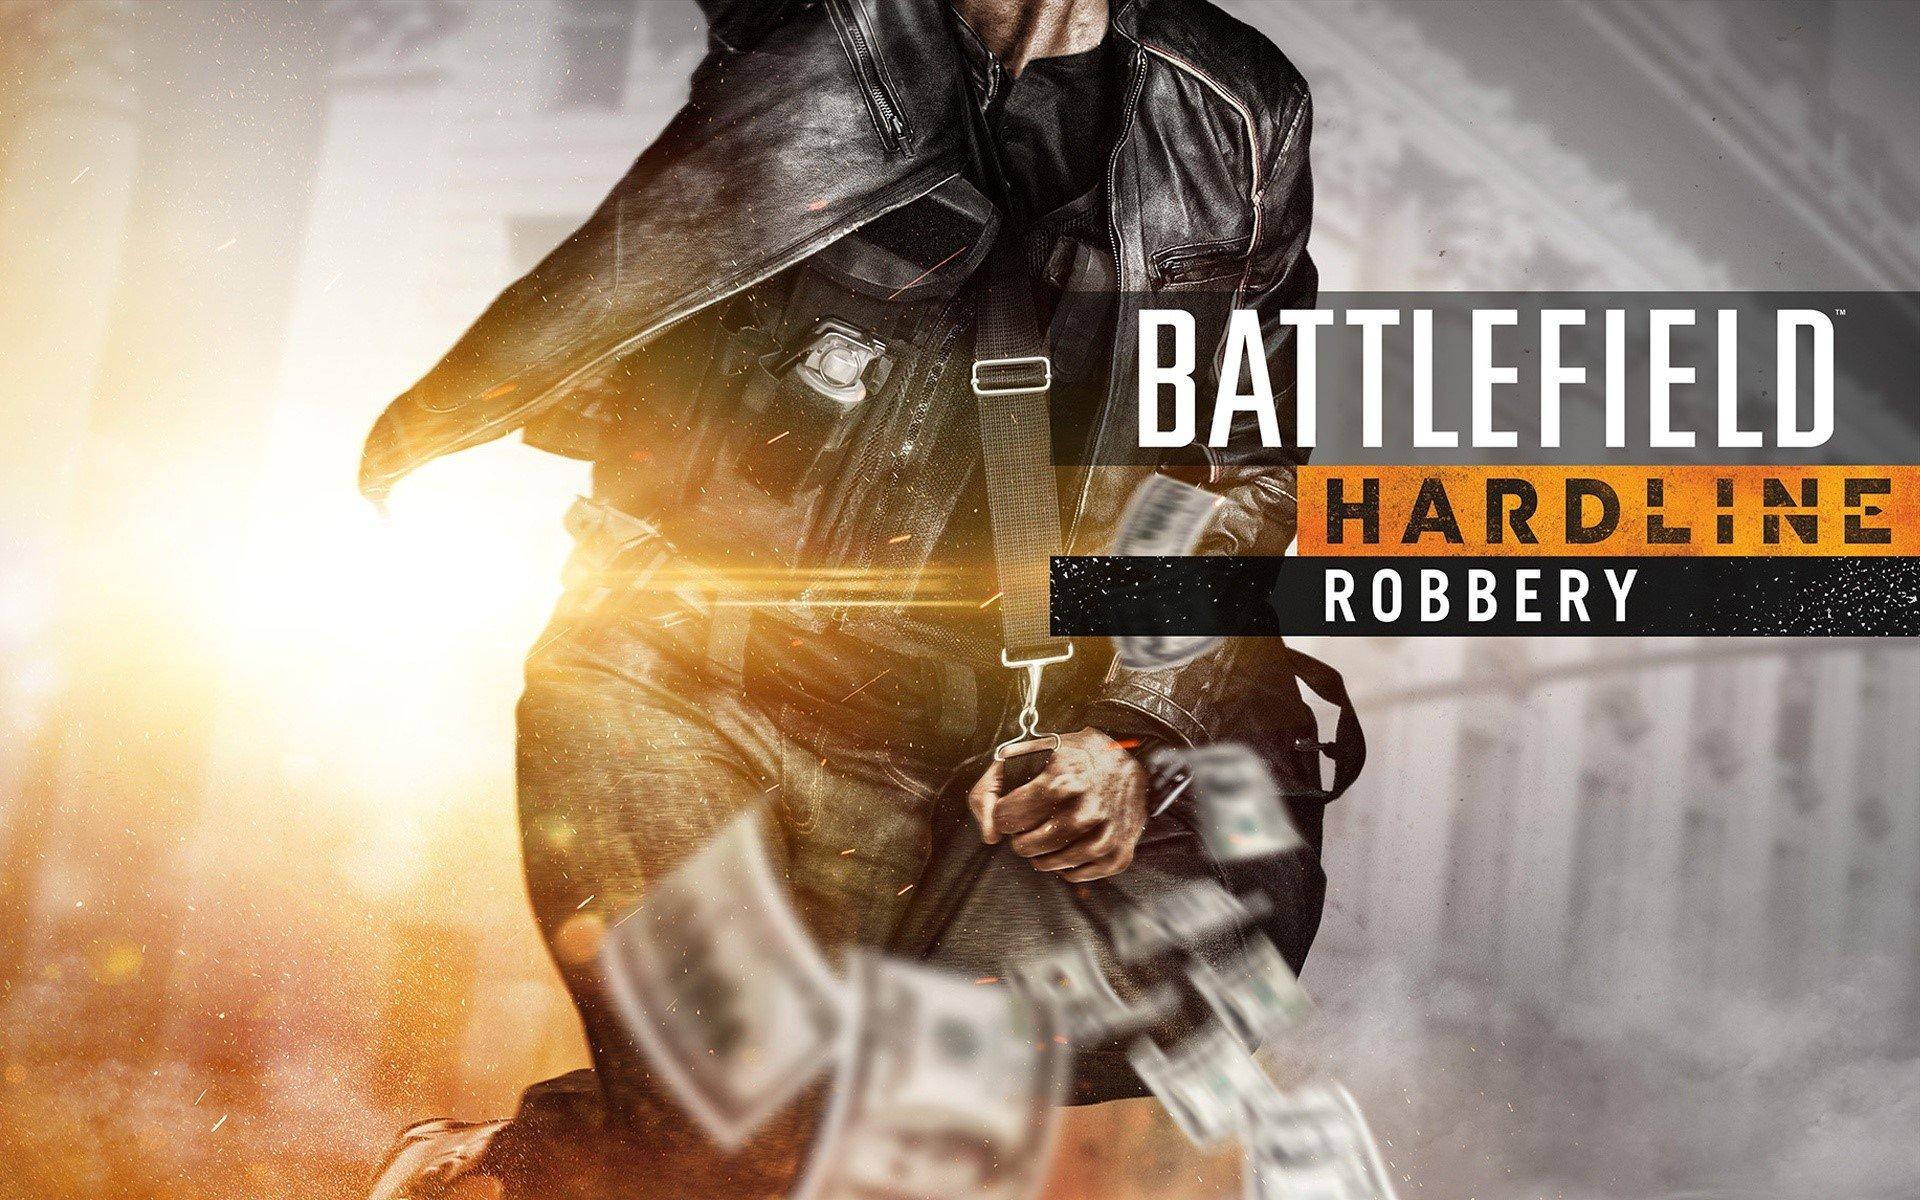 Wallpaper Battlefield Hardline Robbery